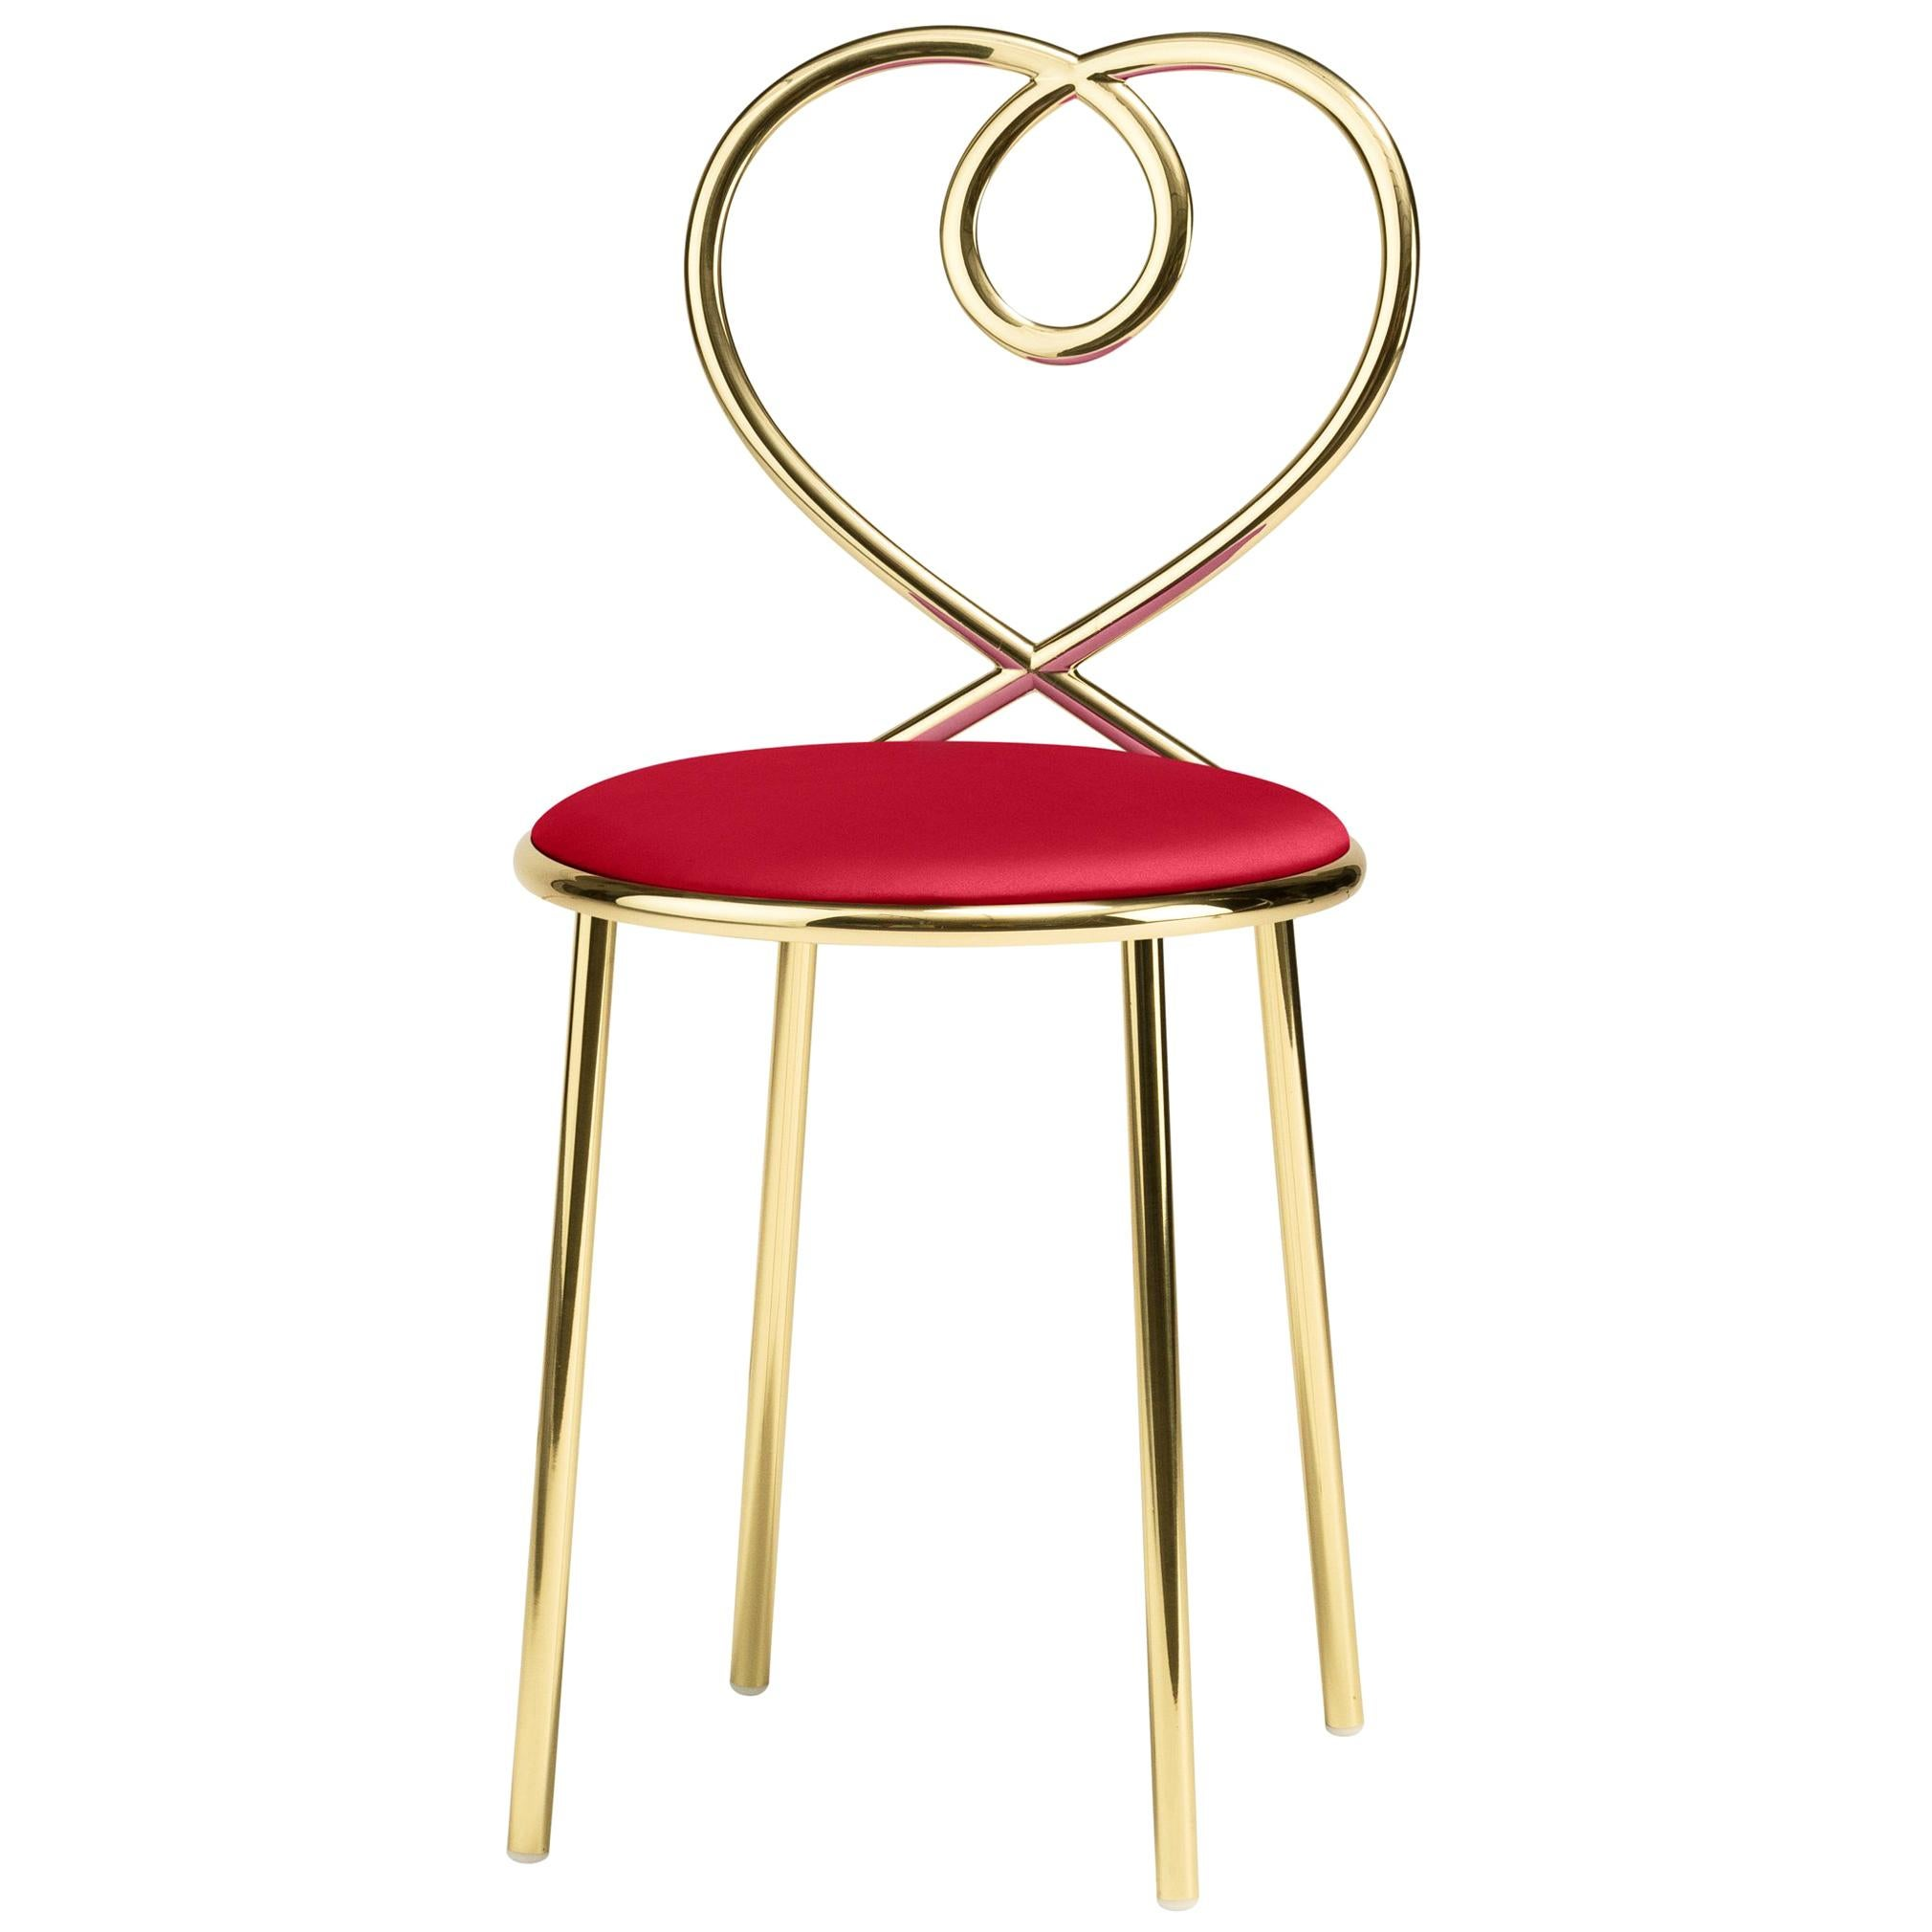 Ghidini 1961 Love Chair Rubis in Polished Brass by Nika Zupanc